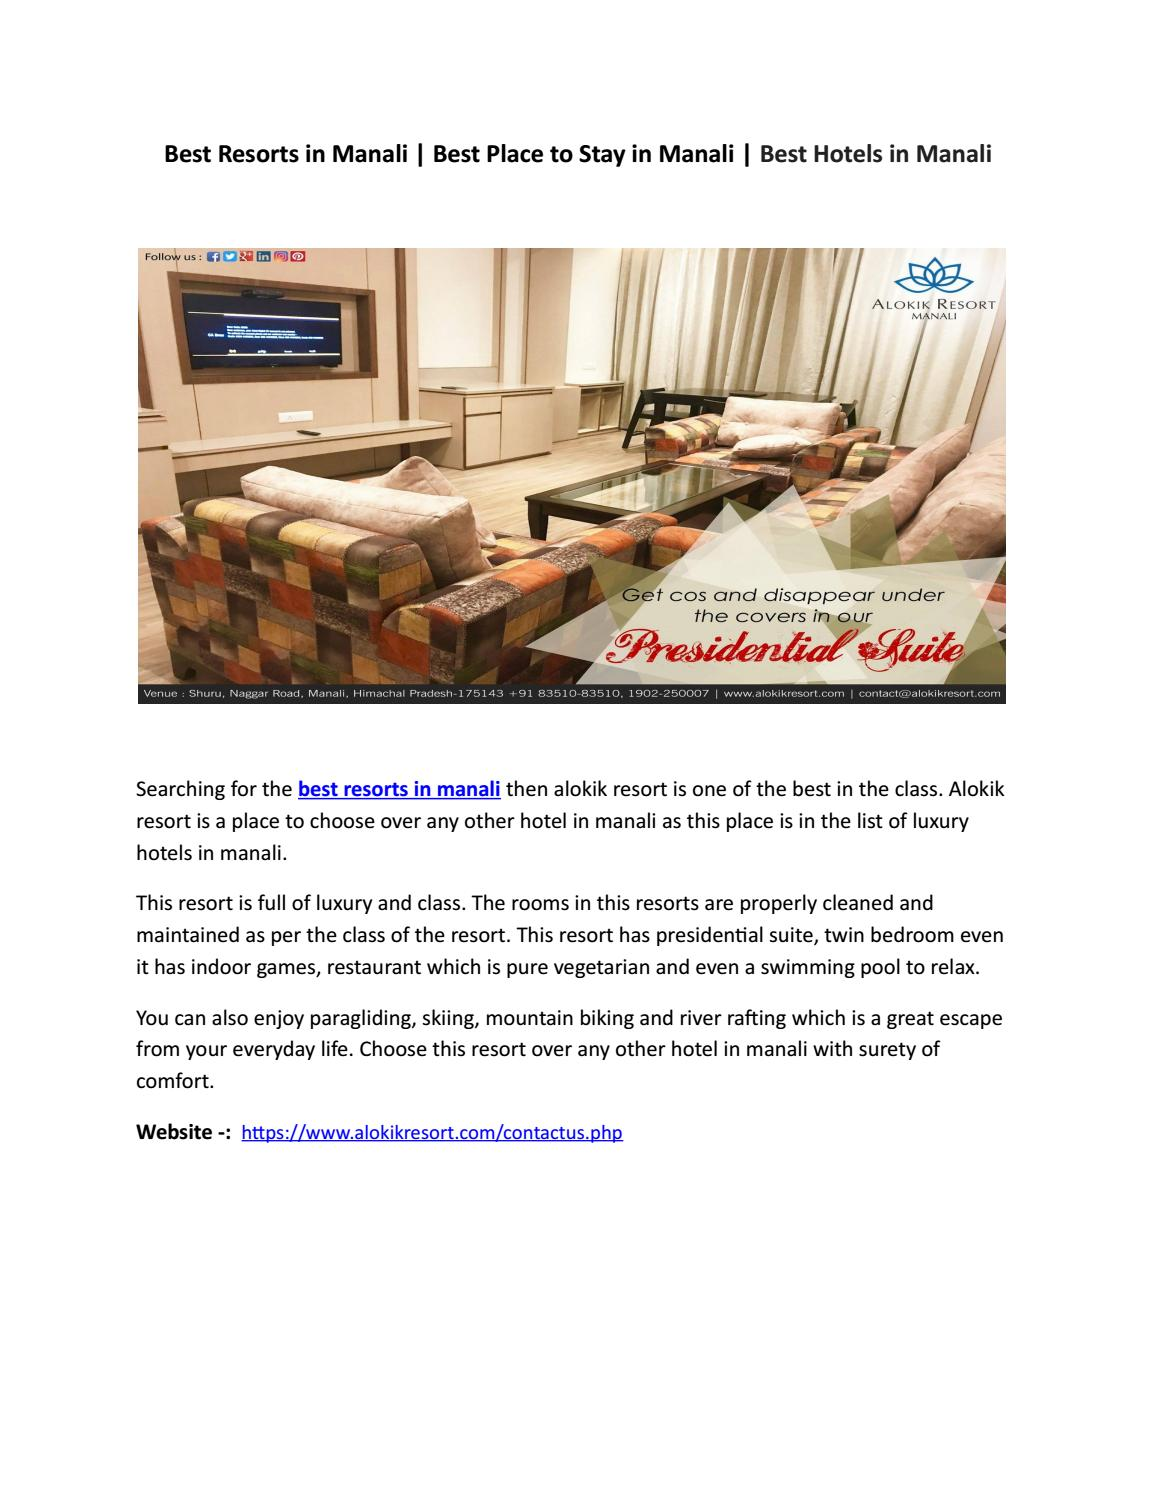 Best Resorts in Manali | Best Place to Stay in Manali - Alokik Resort